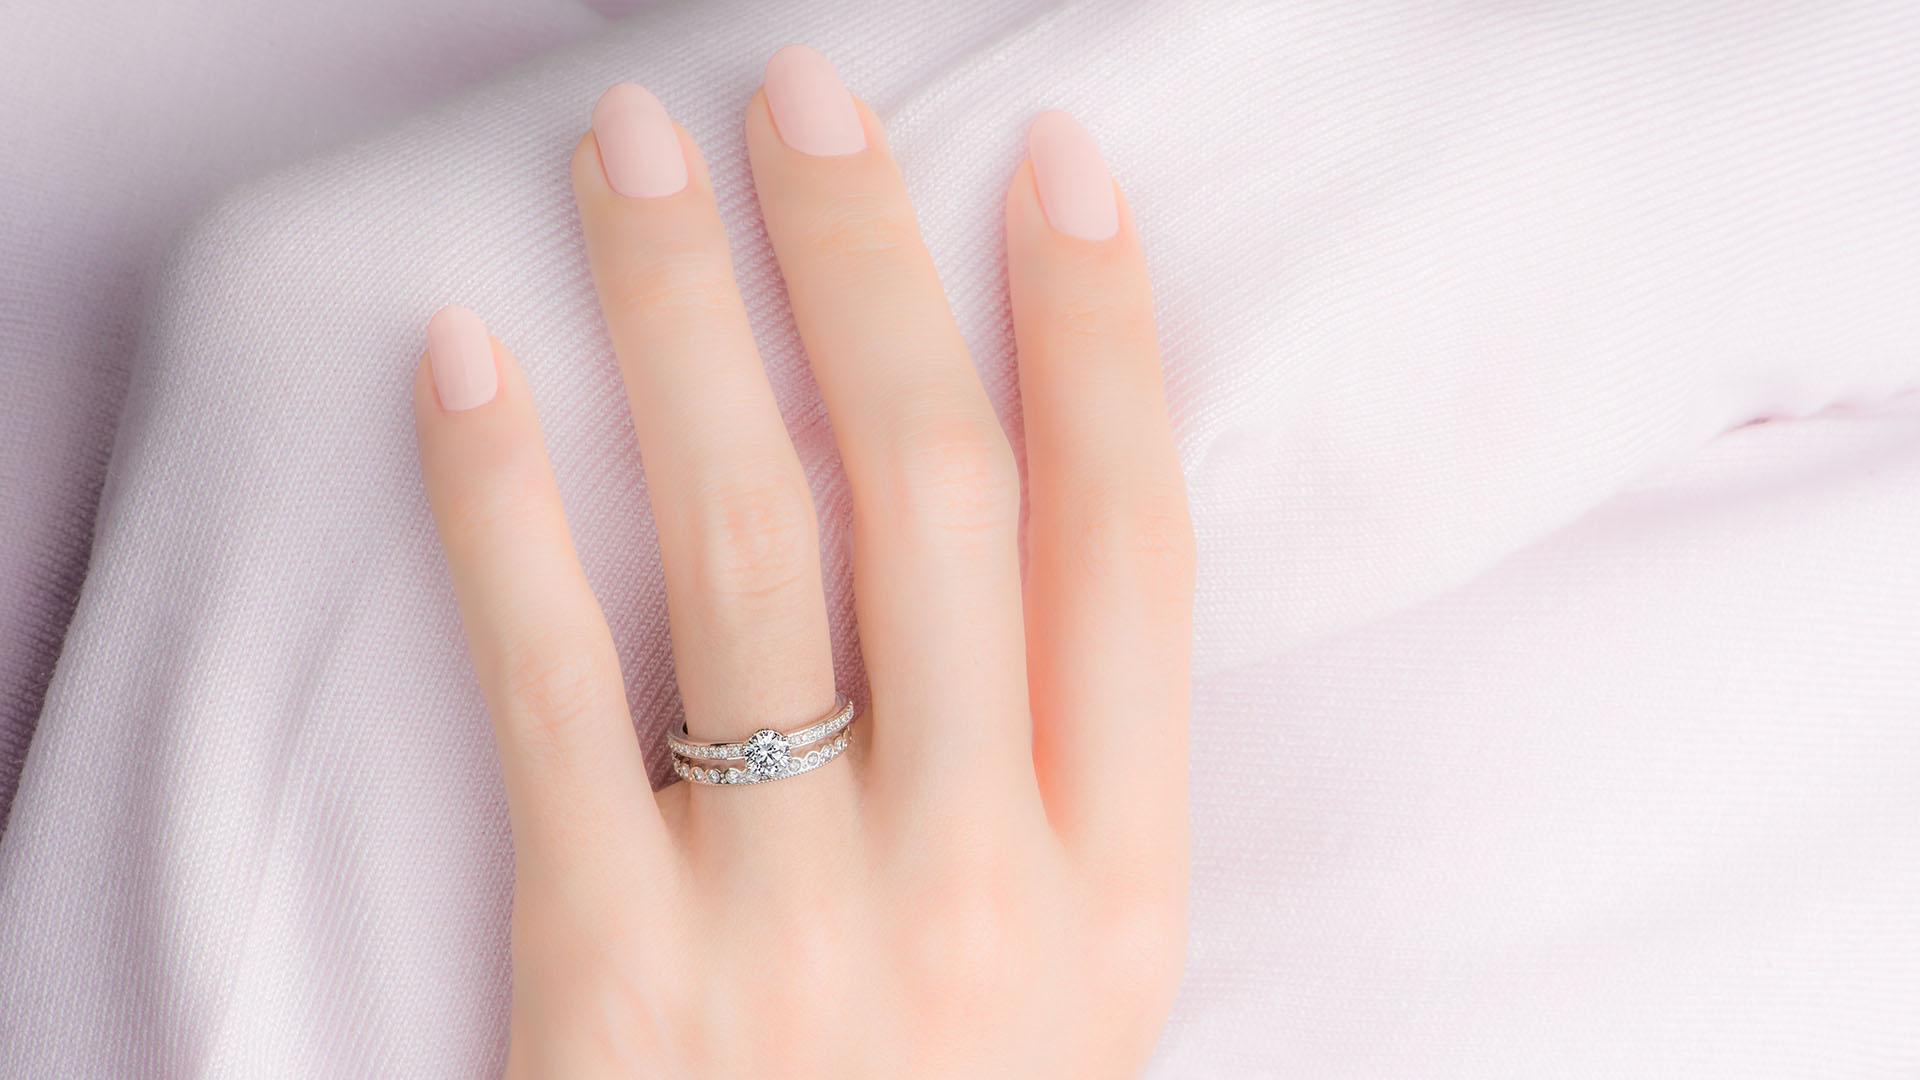 ariadne アリアドネ | 結婚指輪サムネイル 2